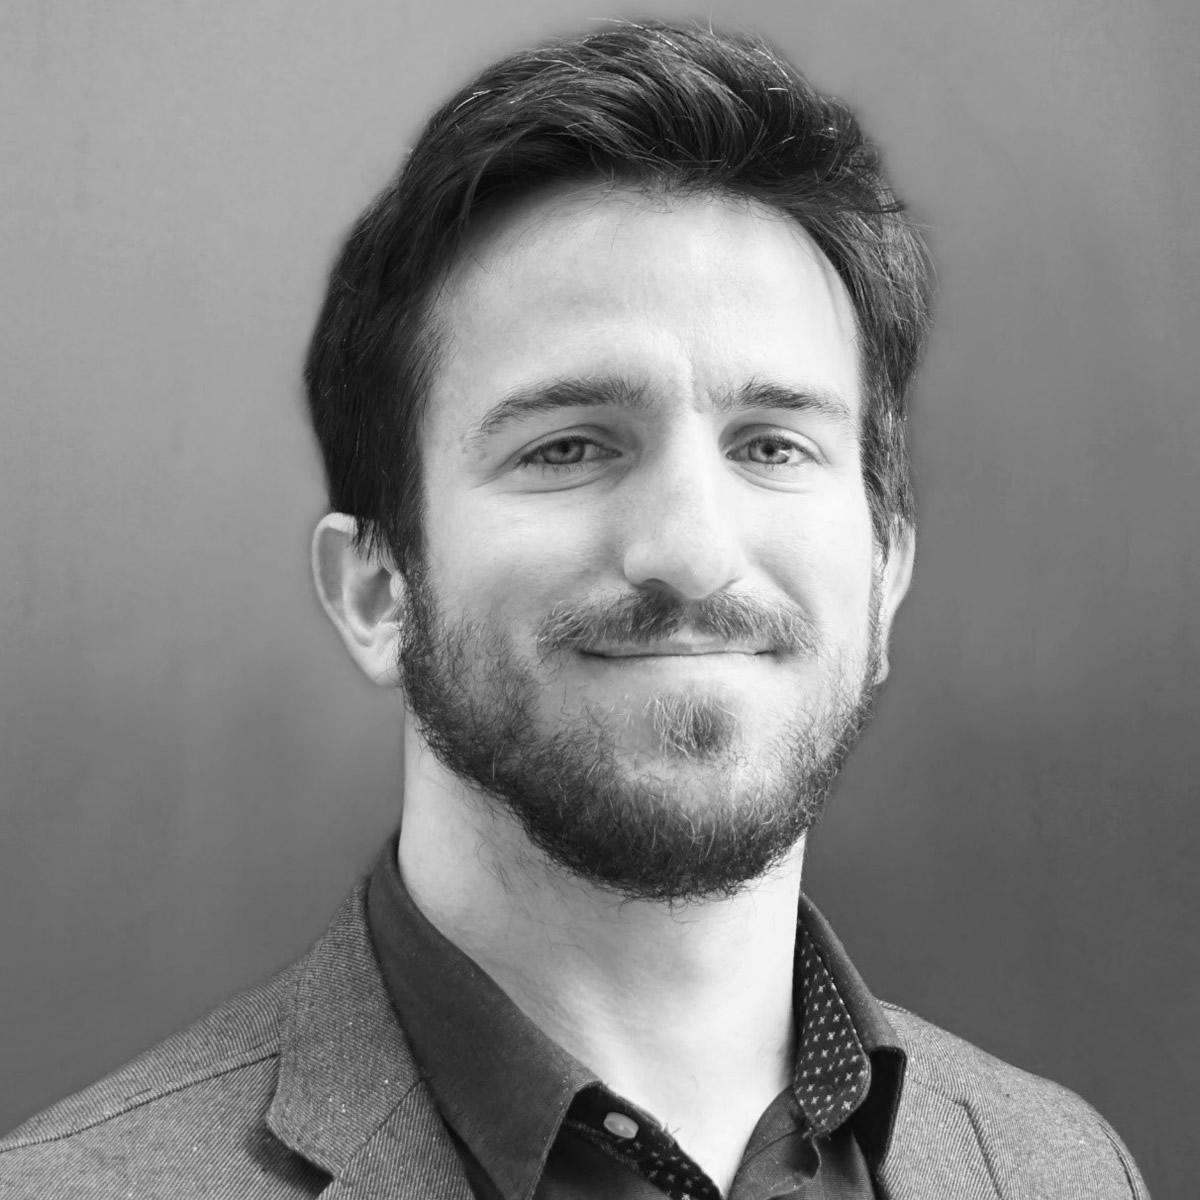 Donato Calace, Vice President, Accounts & Innovation; Datamaran